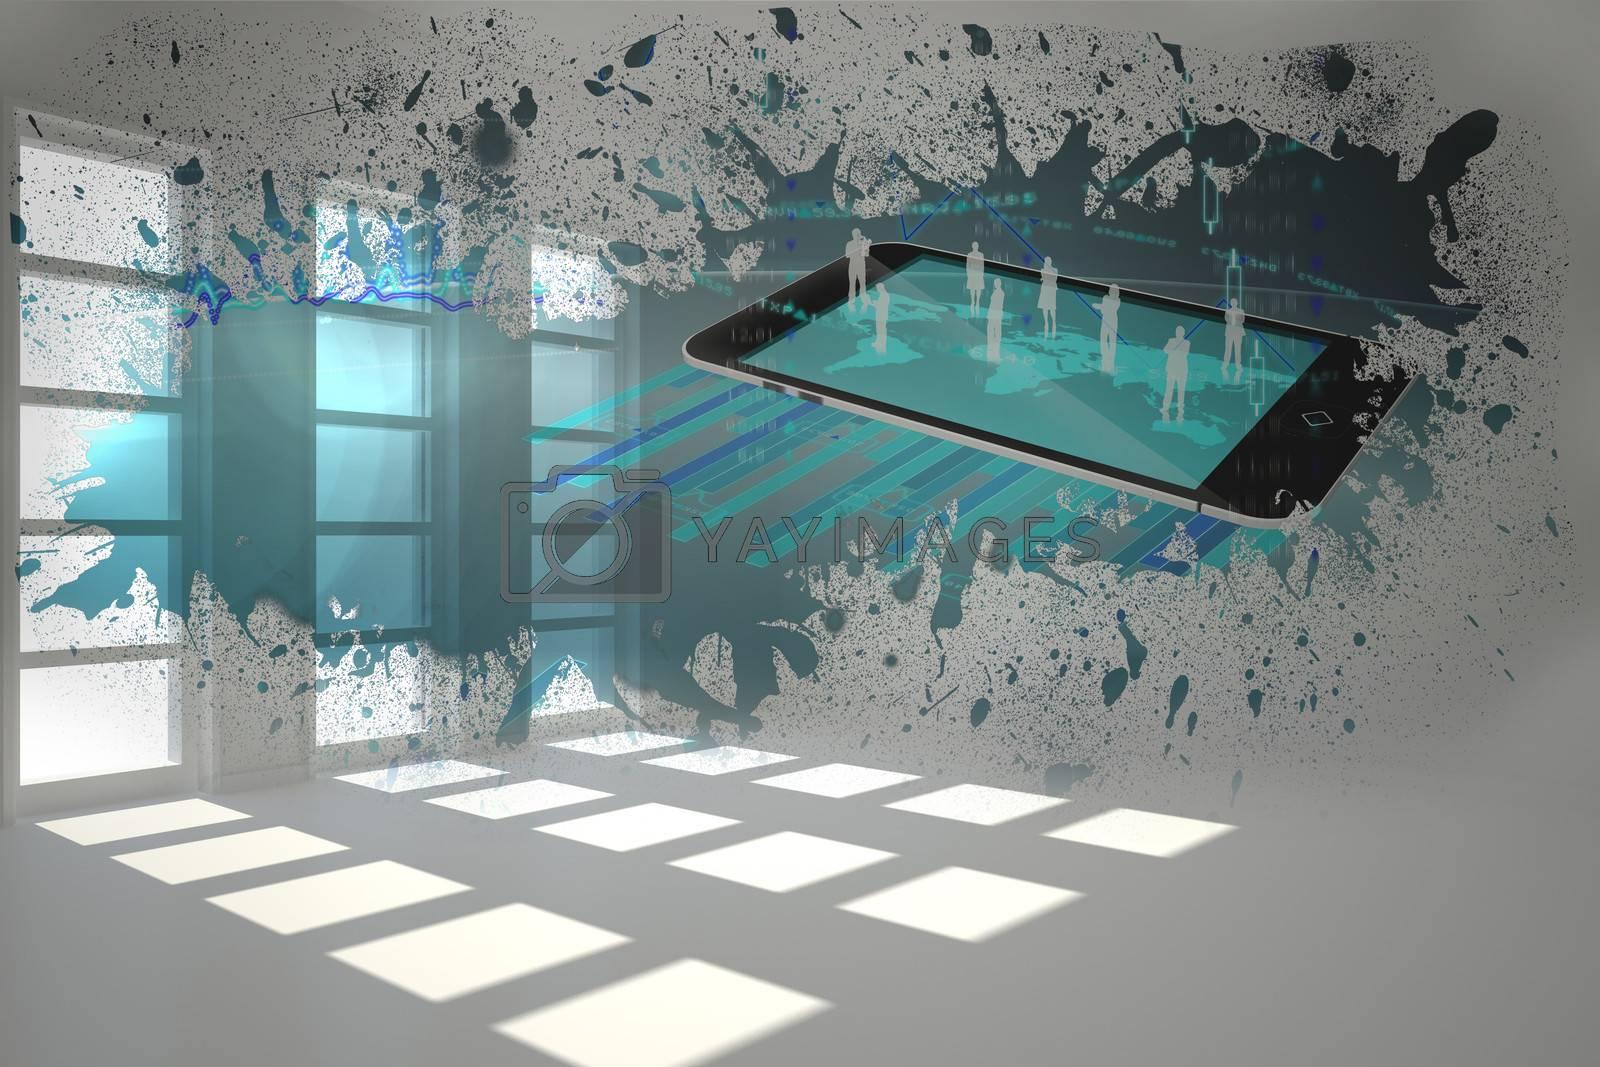 Splash showing global communication